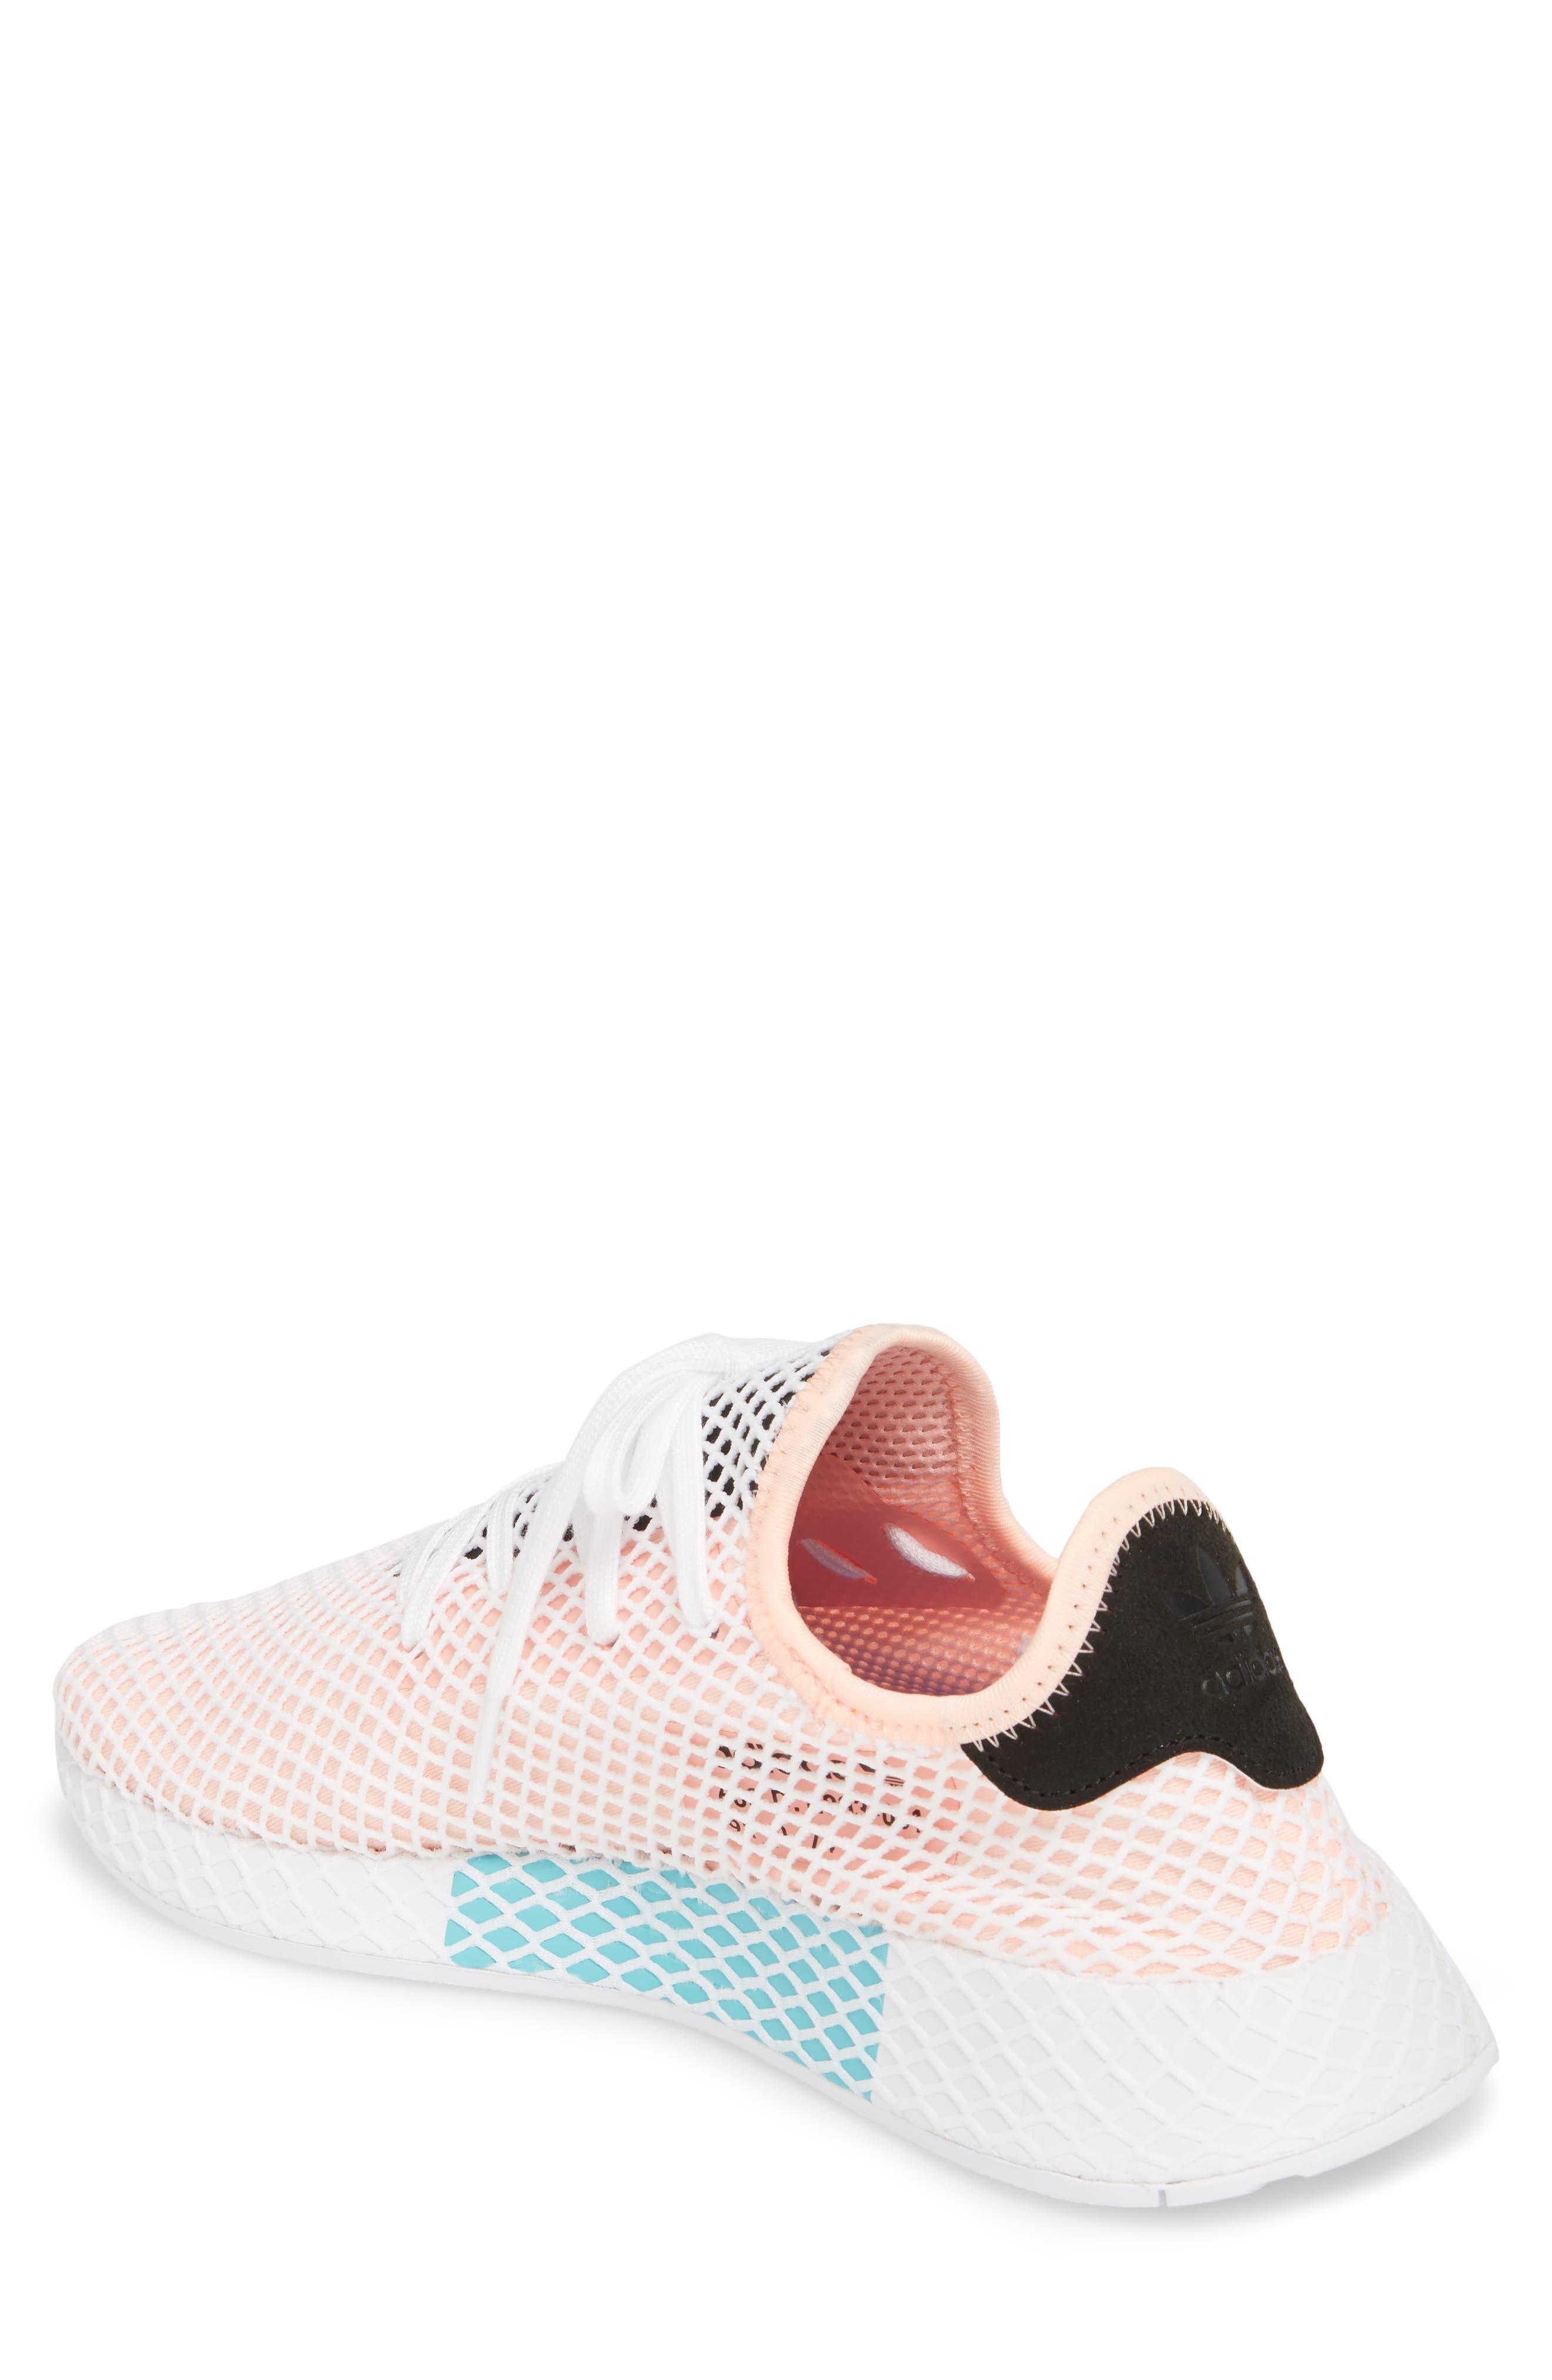 Deerupt Runner Sneaker,                             Alternate thumbnail 18, color,